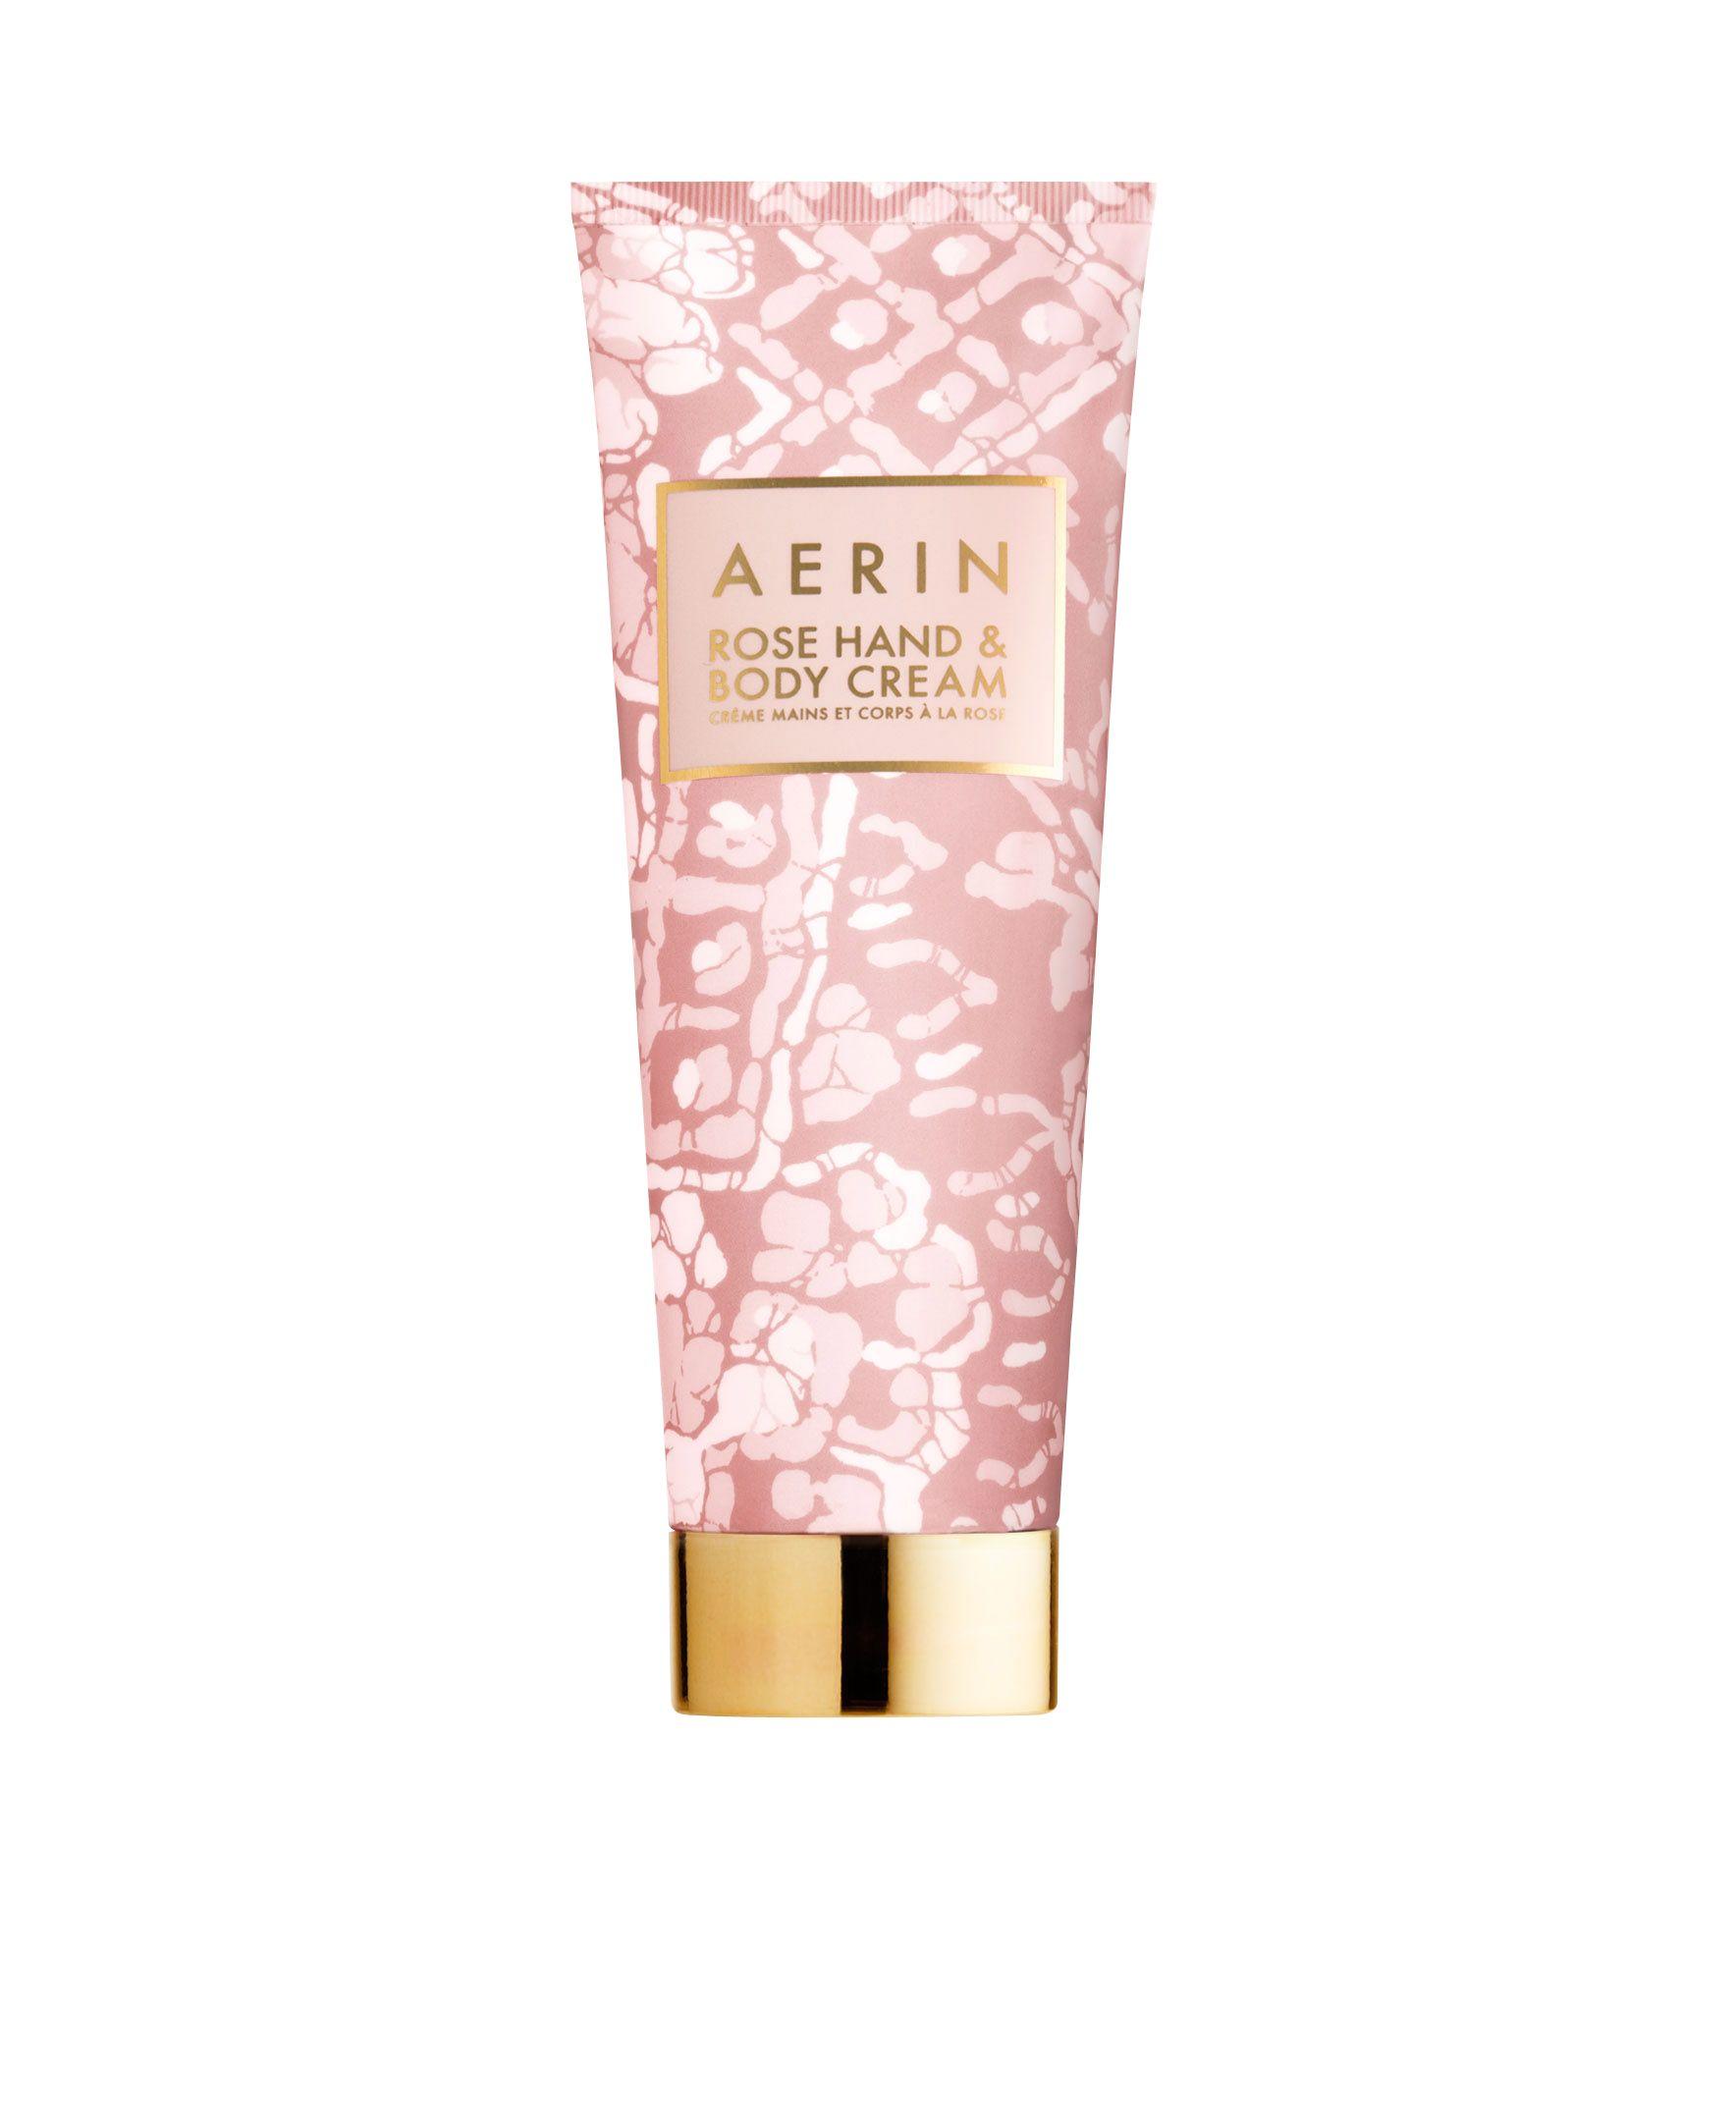 AERIN AERIN Rose Hand & Body Cream, 250ml